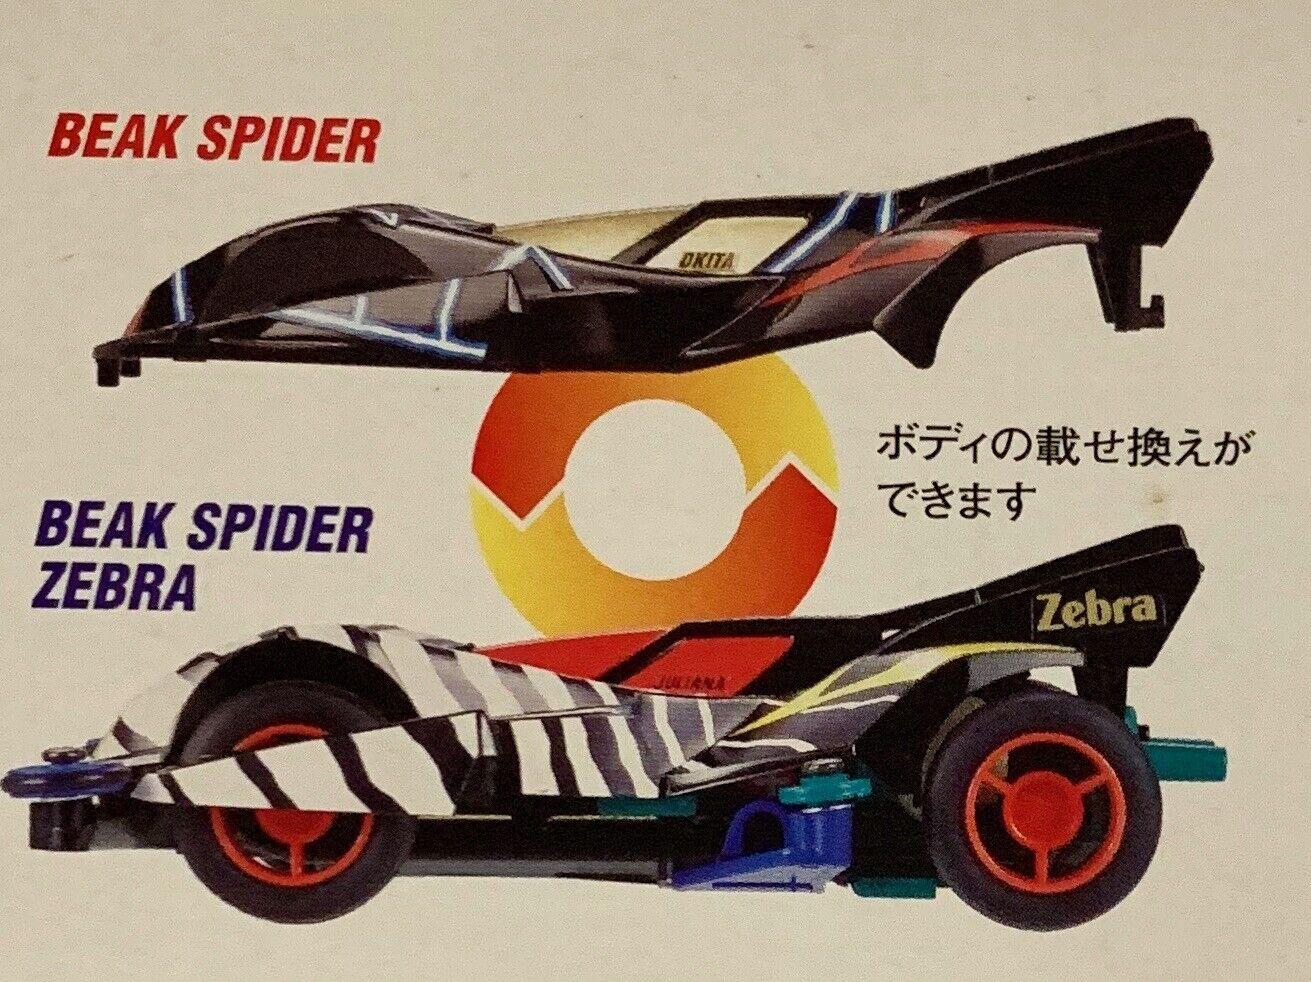 Tamiya 19422 Mini 4WD Beak Spider Zebra 1//32 NZA